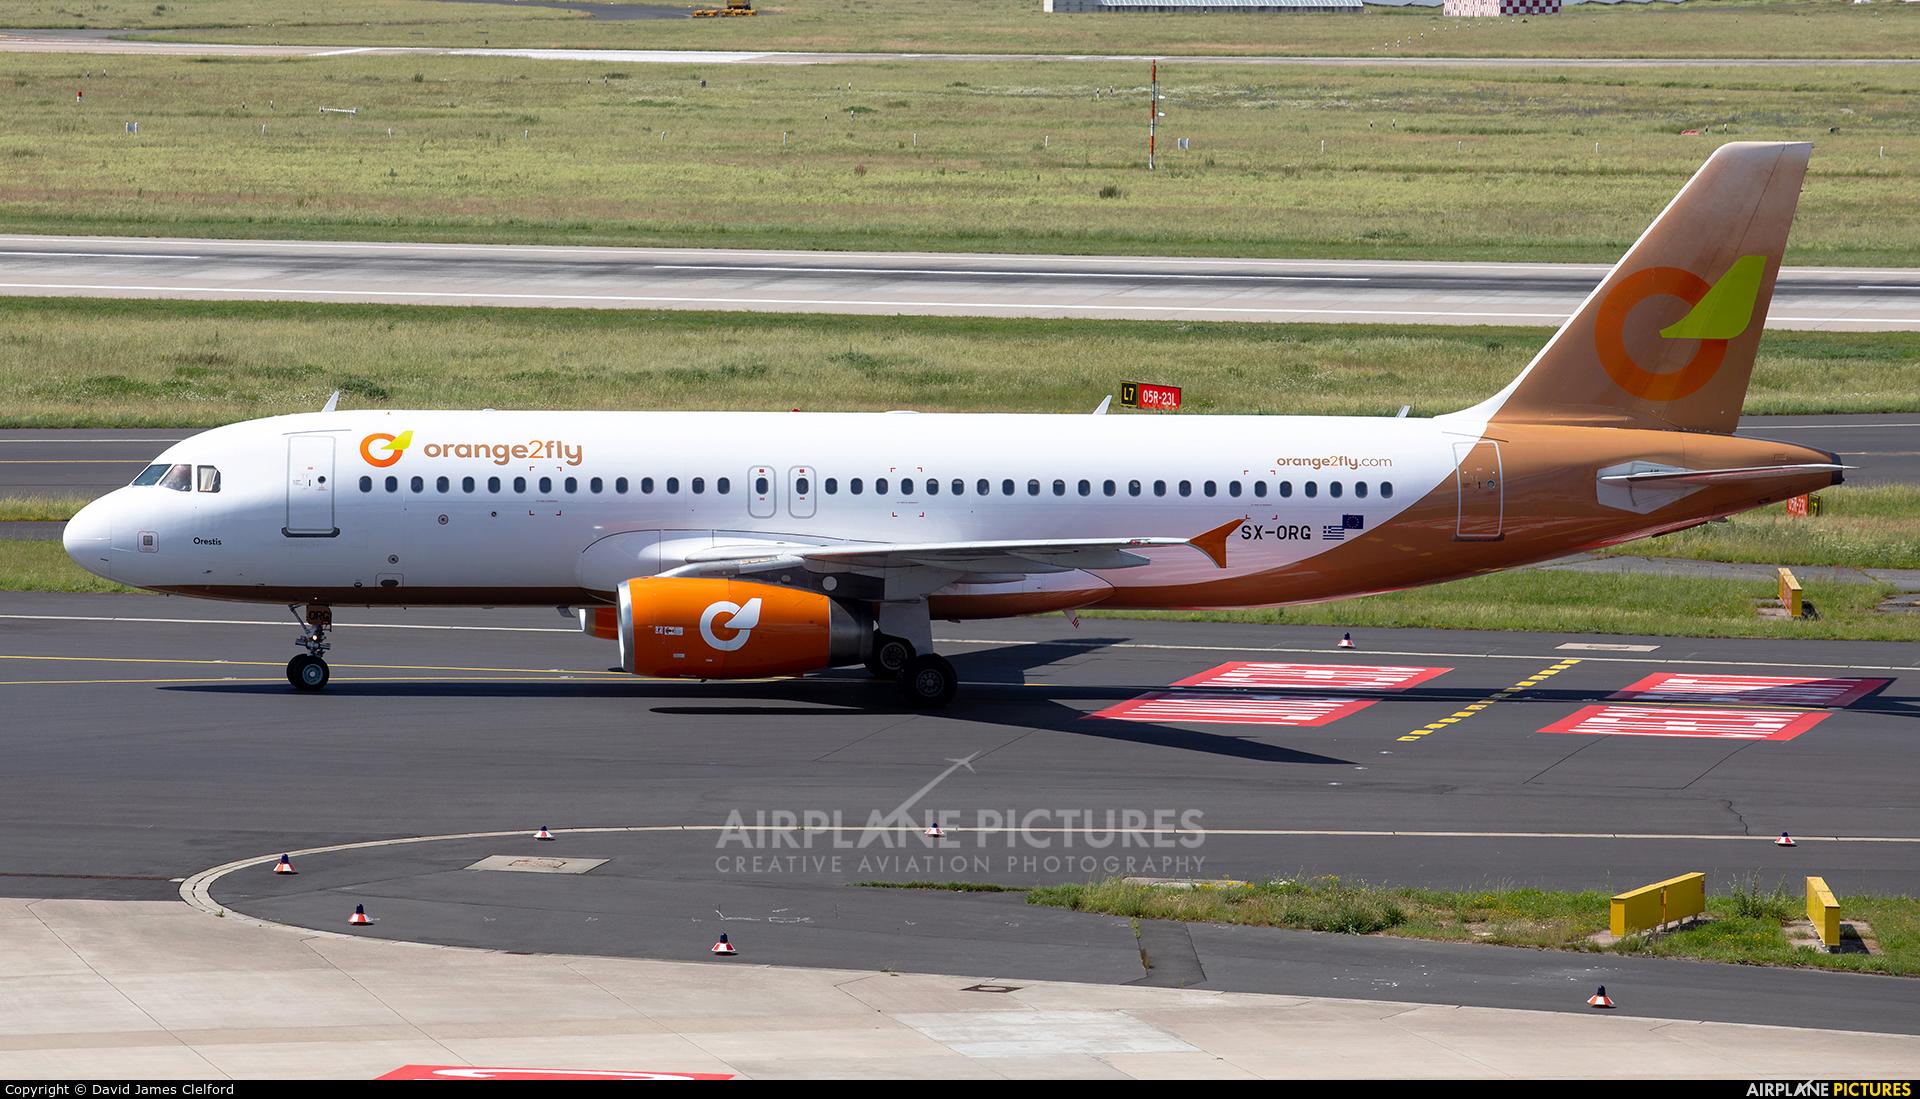 orange2fly SX-ORG aircraft at Düsseldorf